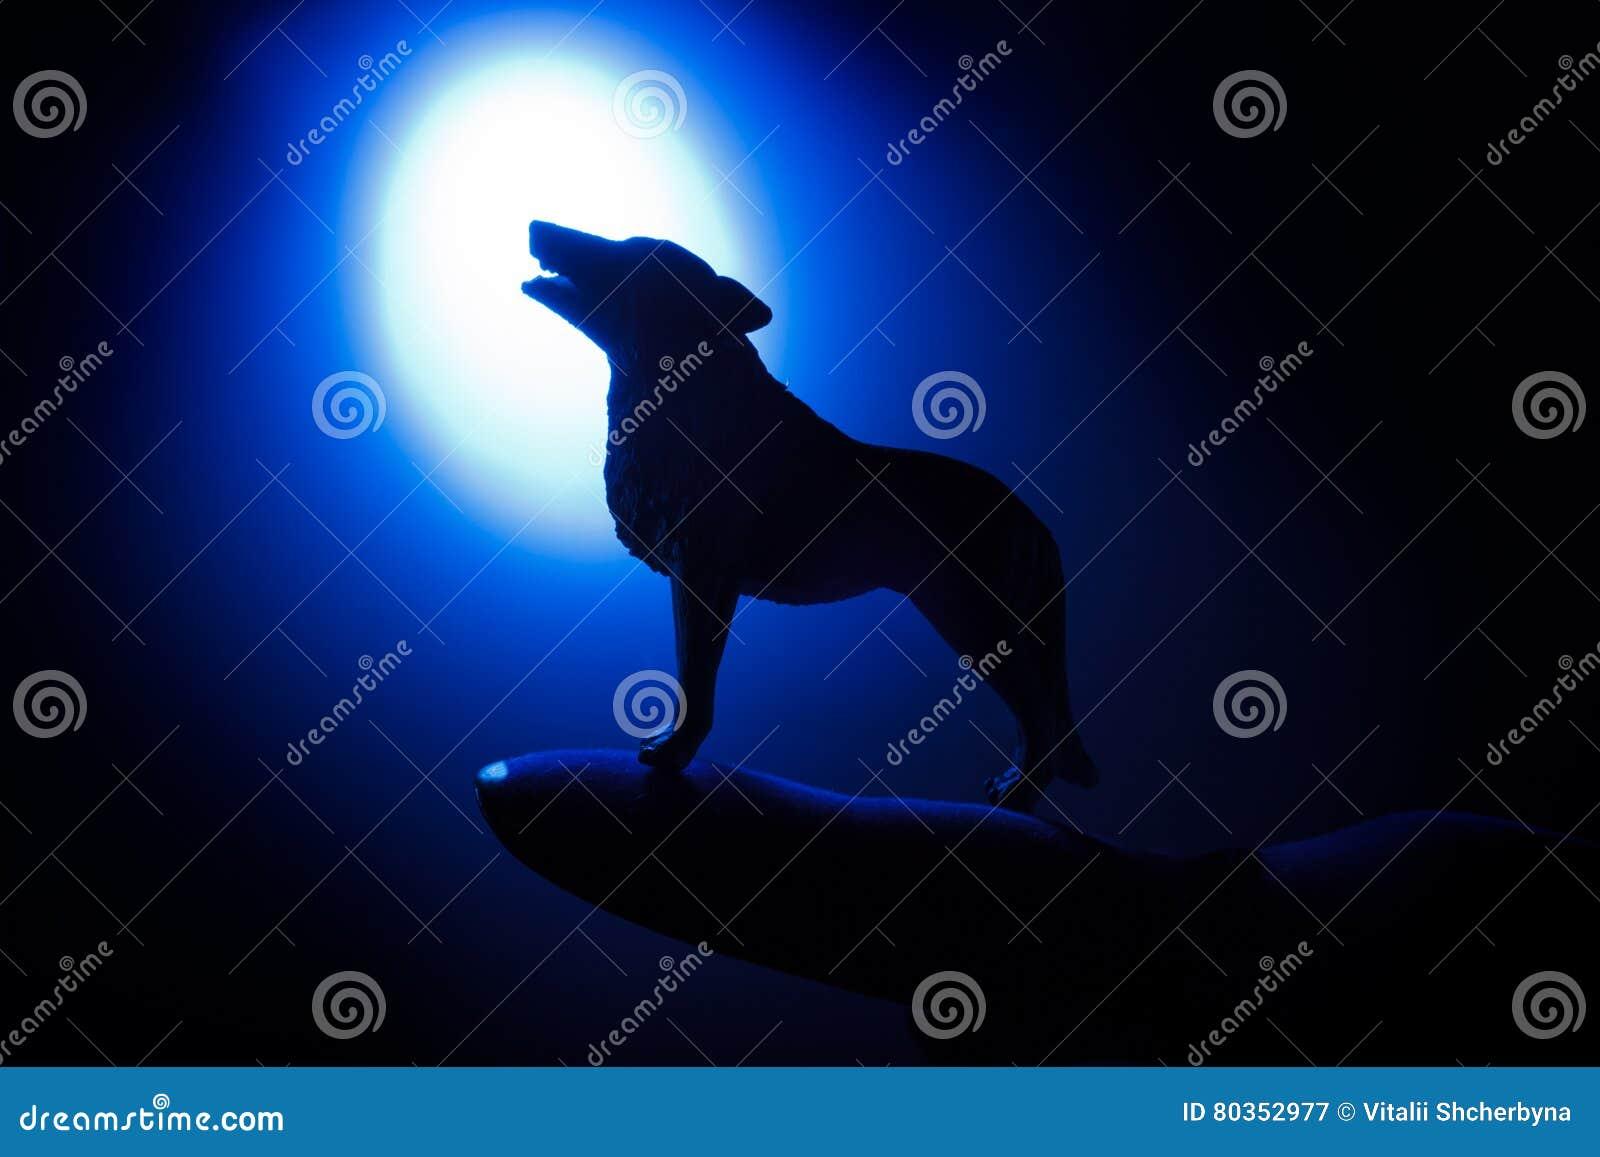 Lobo en silueta que grita a la Luna Llena